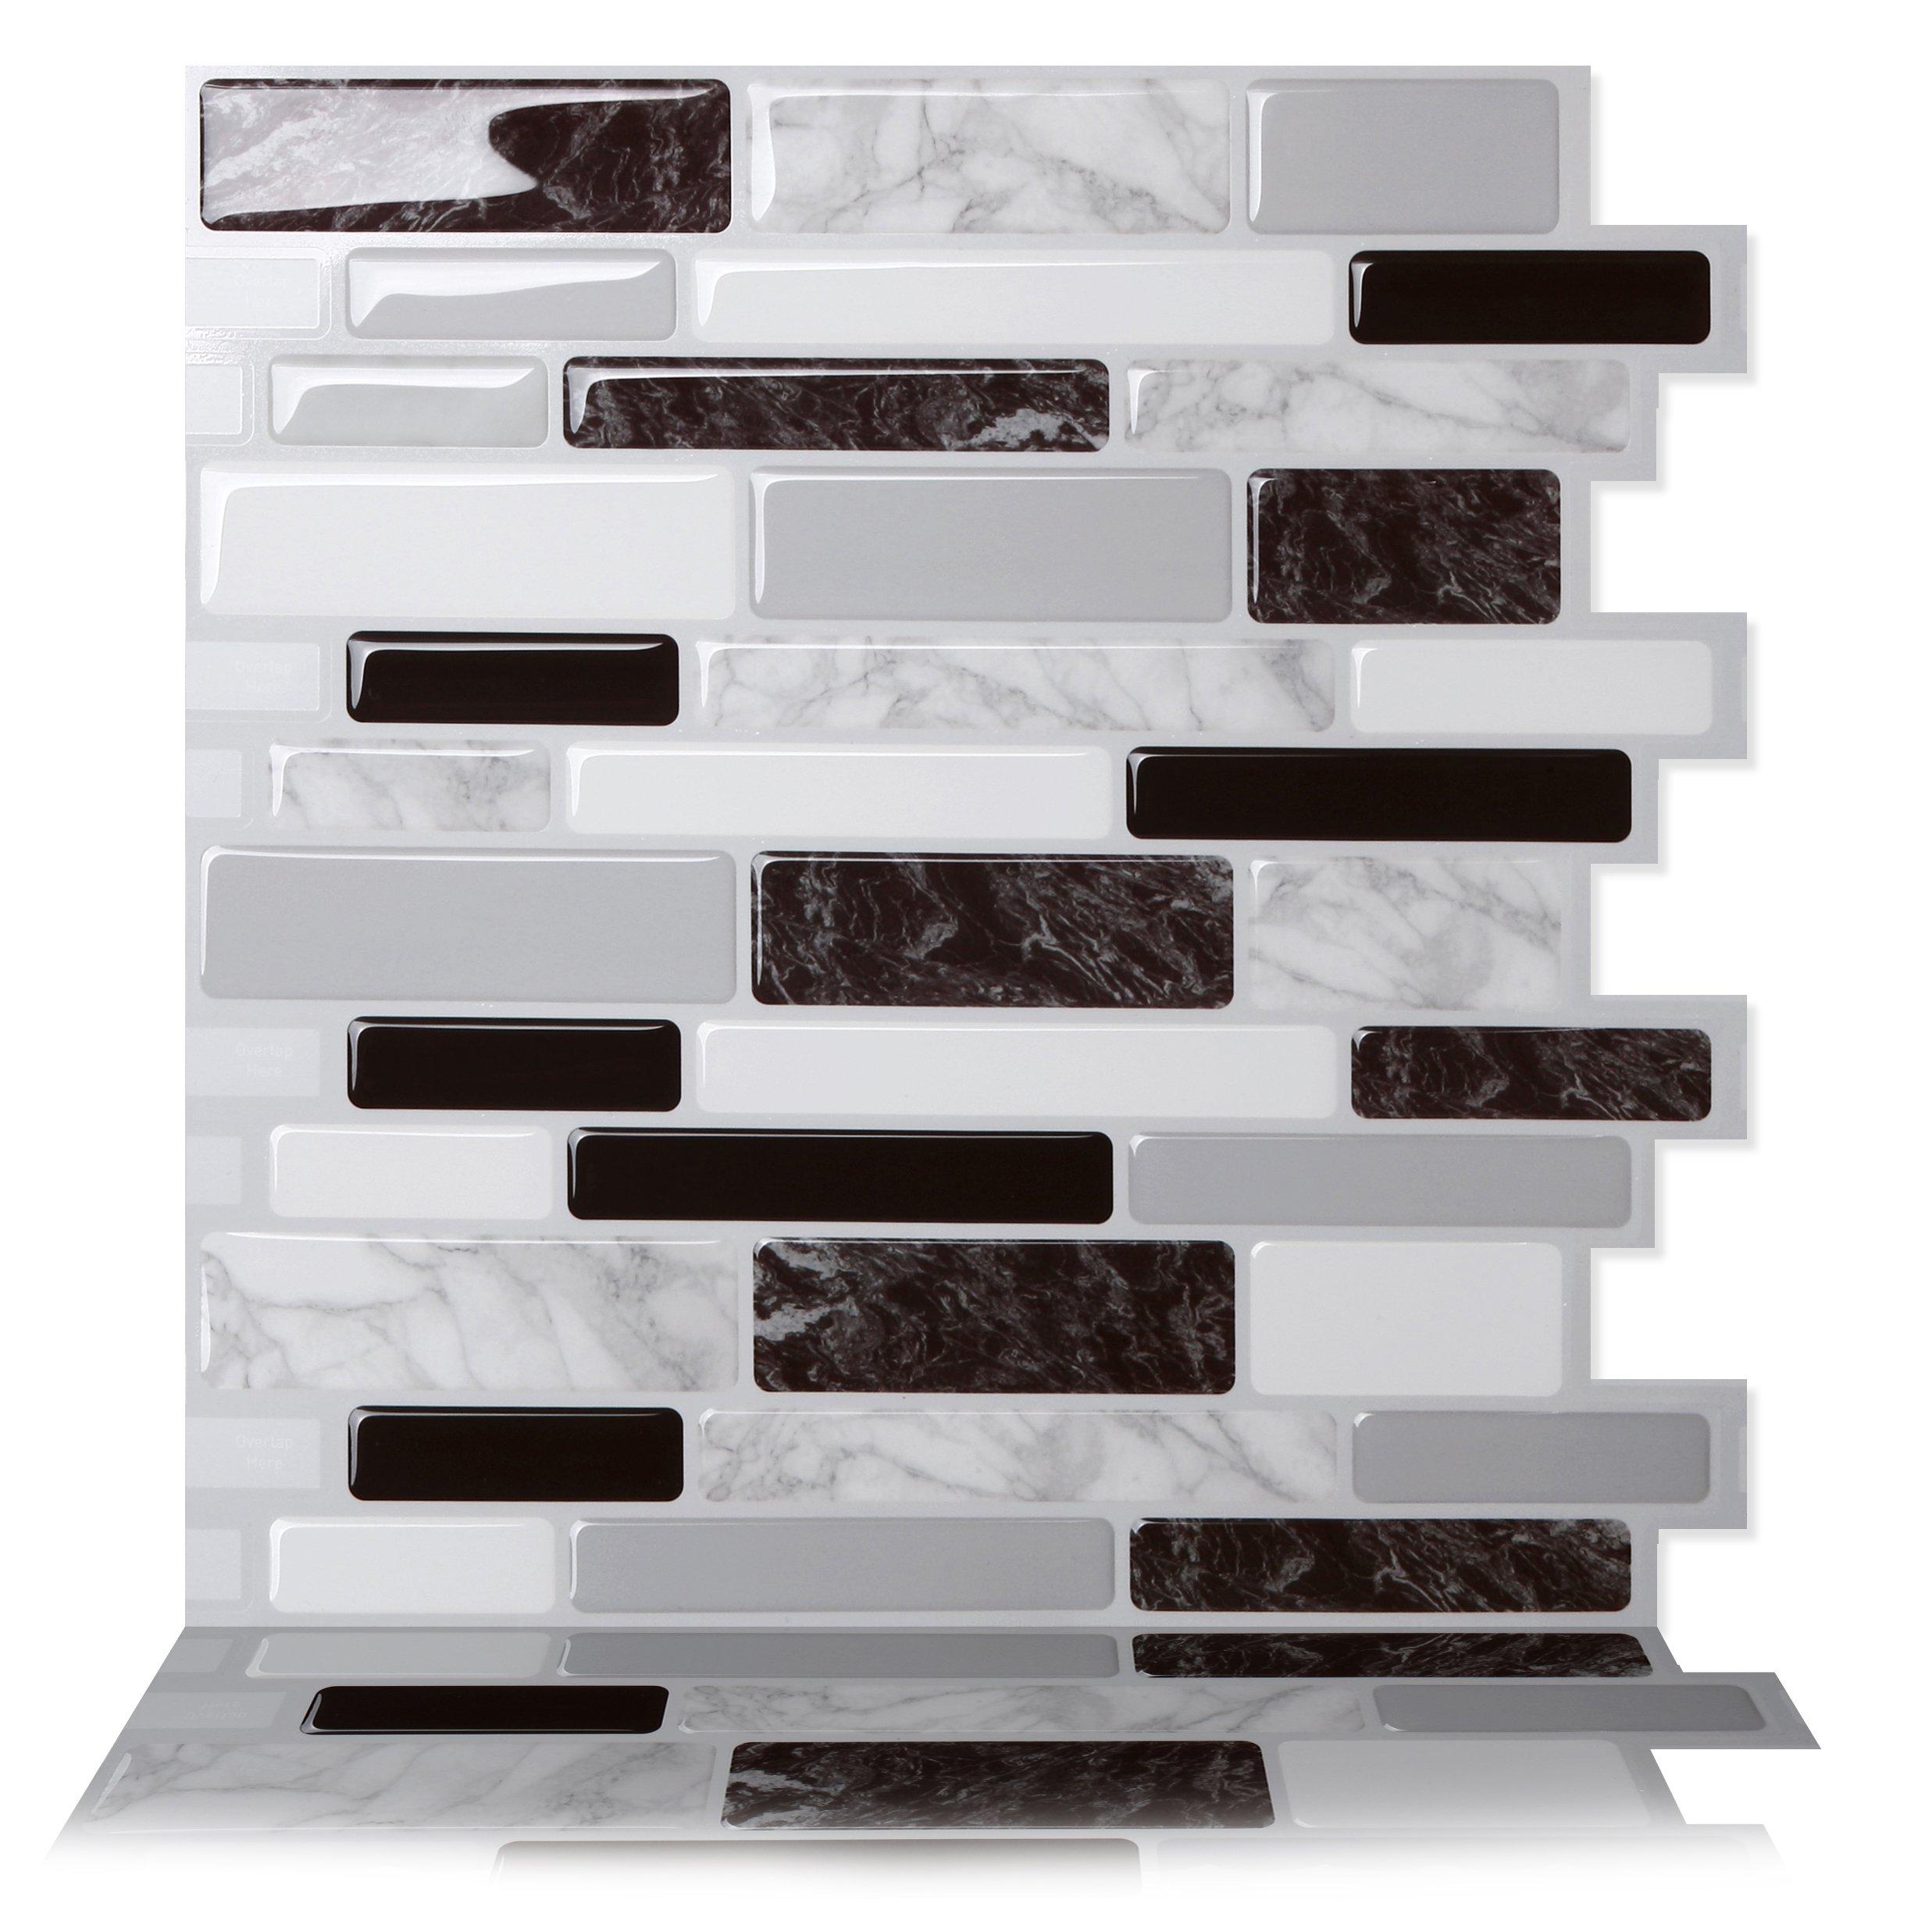 Tic Tac Tiles - Premium Anti-Mold Peel Stick Wall Tile in Polito Black&White (10 Tiles)